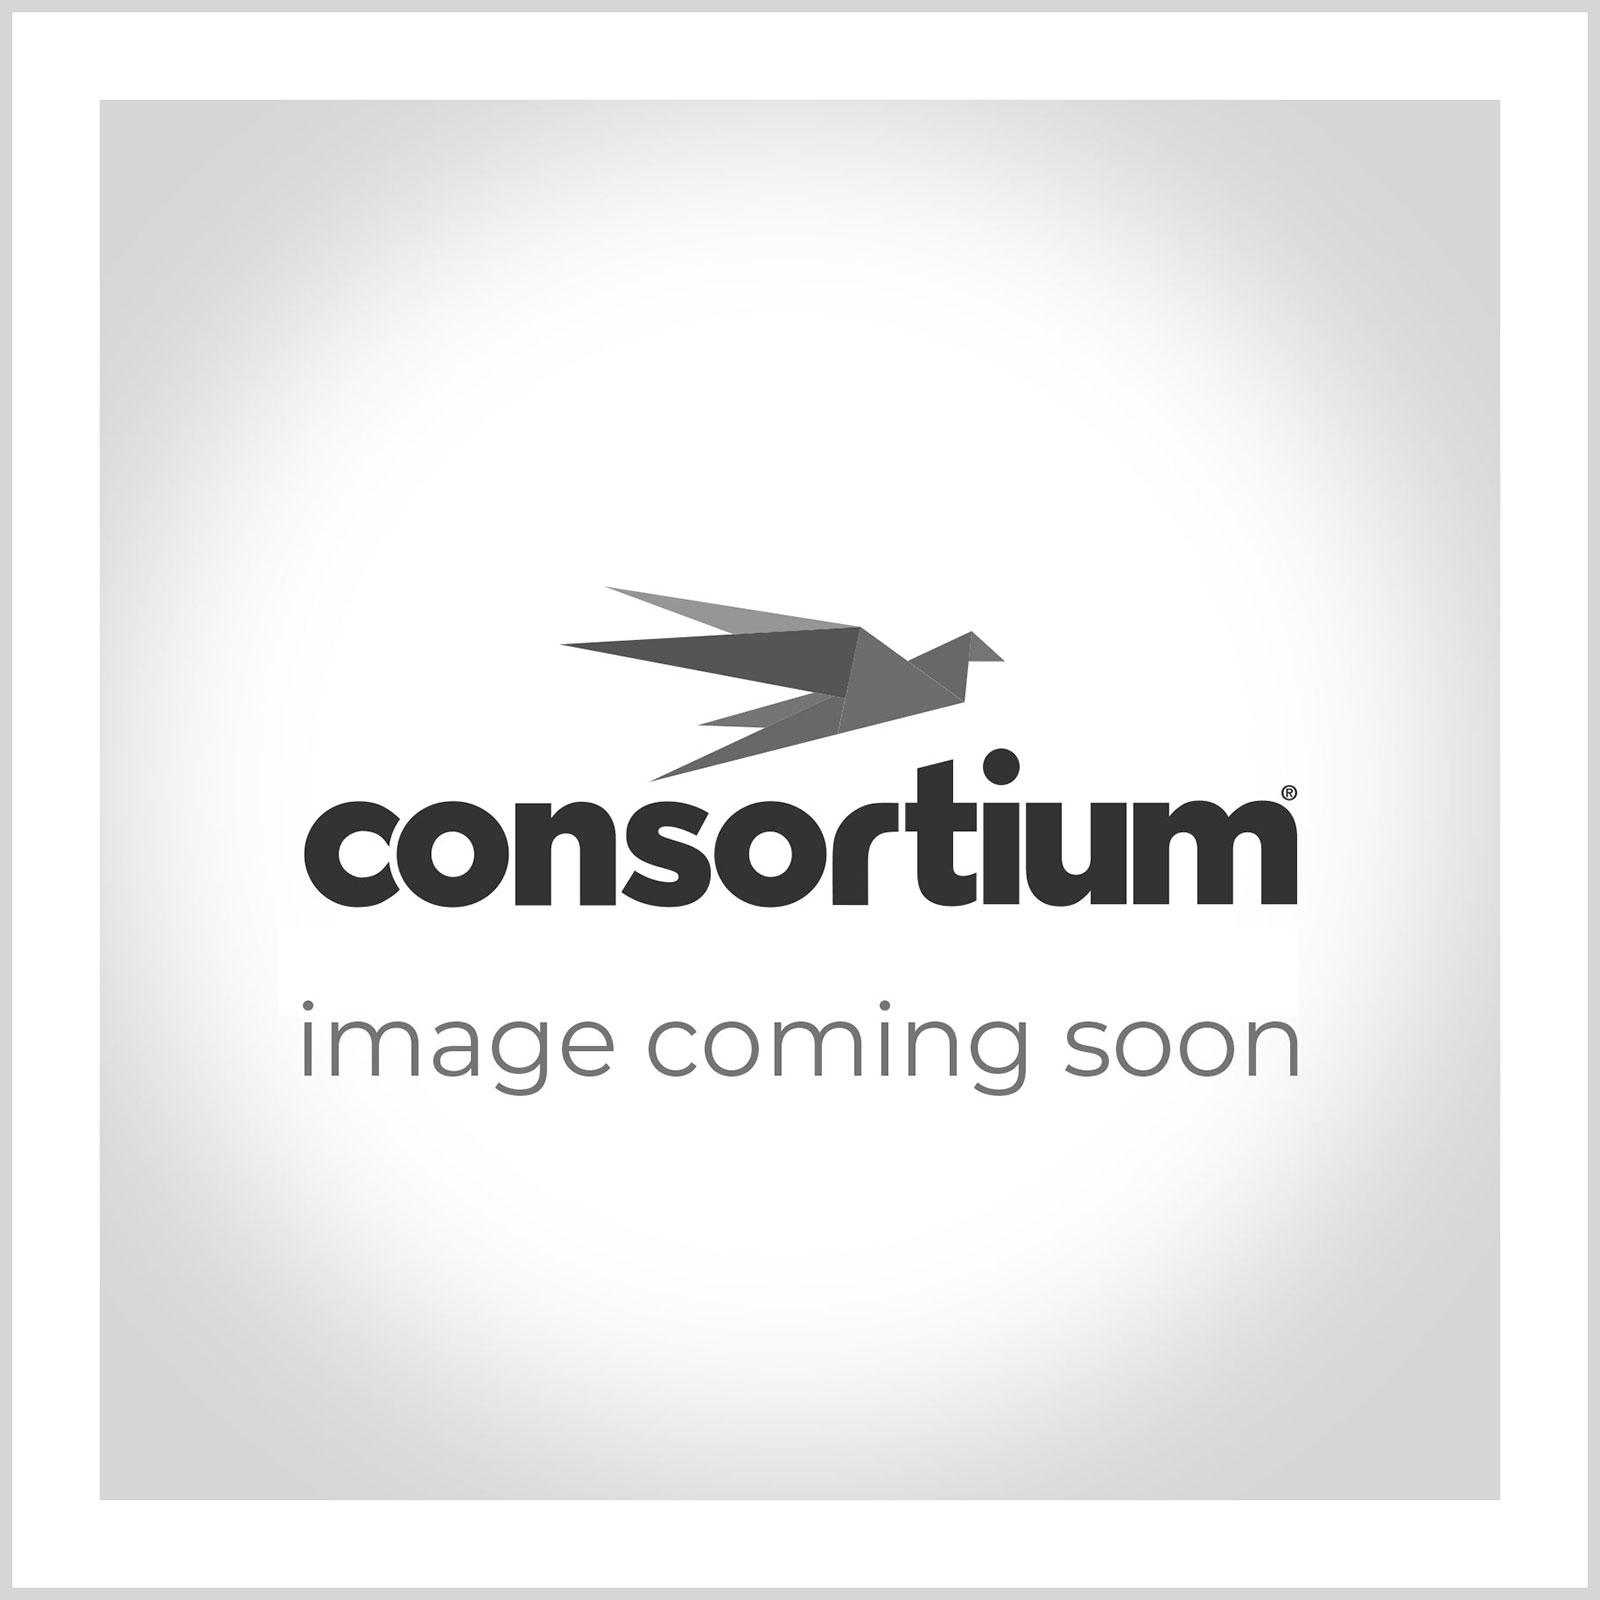 Consortium Superlight Mini Whiteboard Landscape Lined Kit